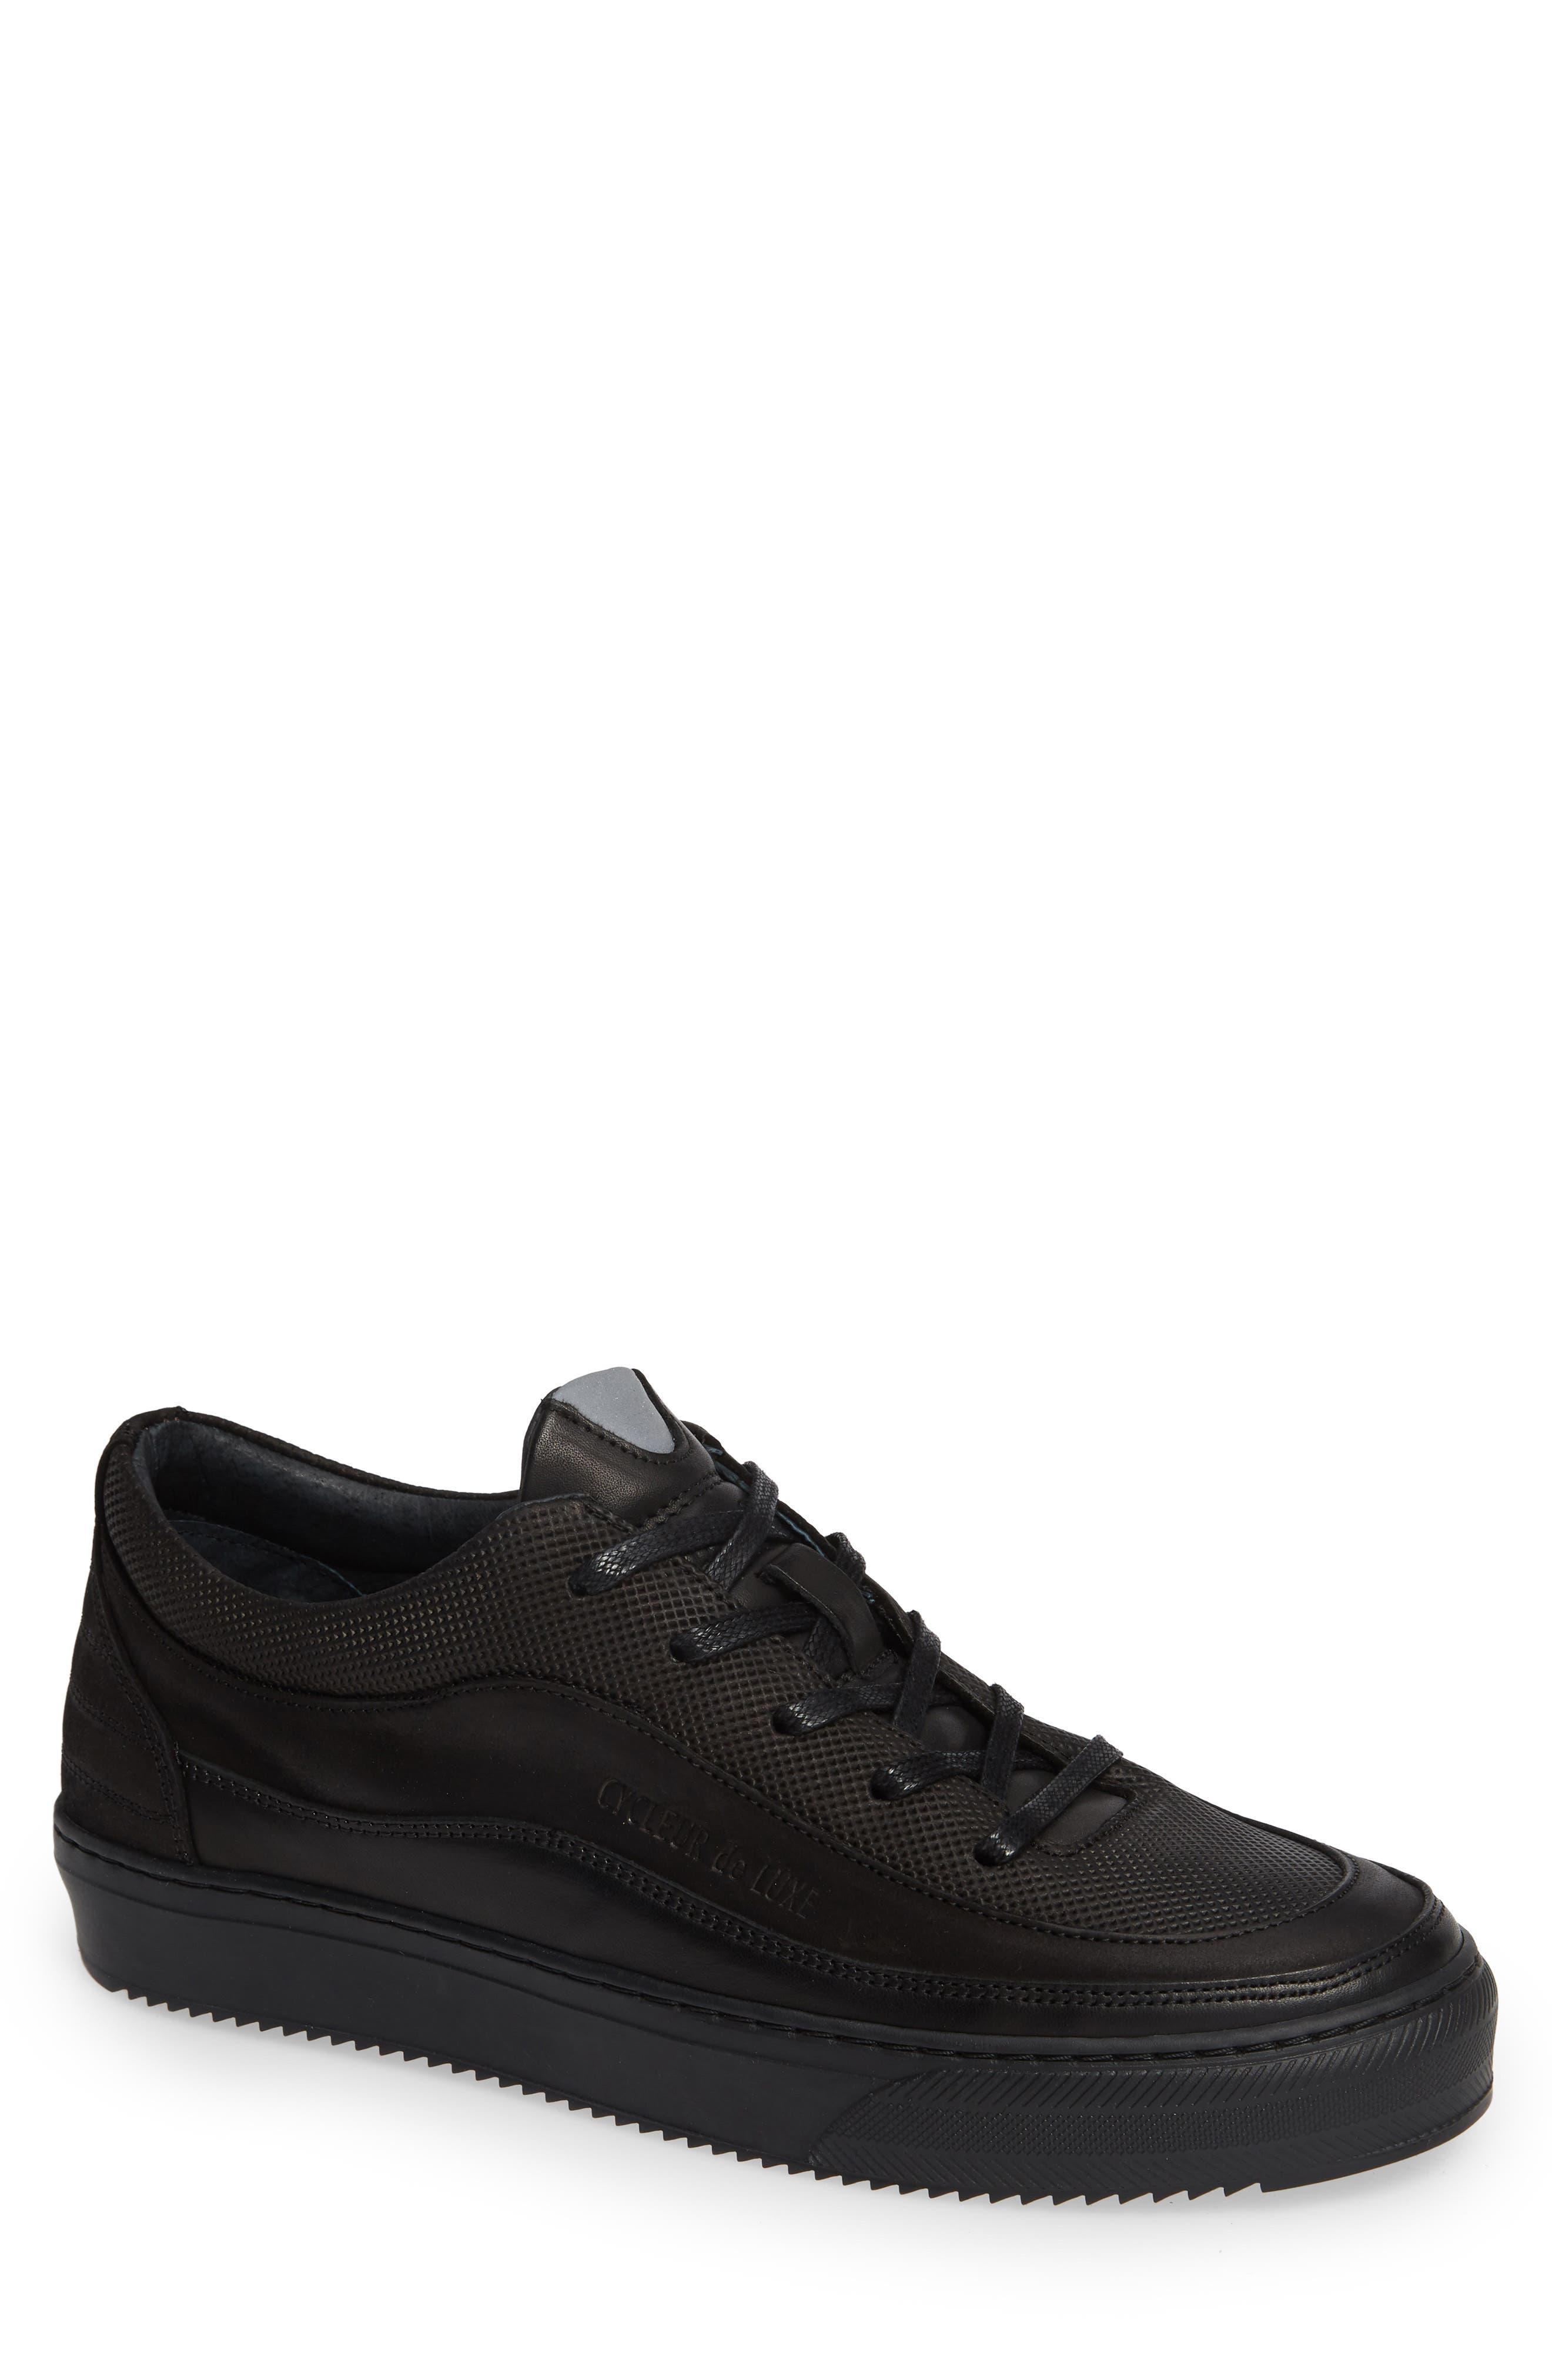 Bullet Sneaker,                         Main,                         color, BLACK